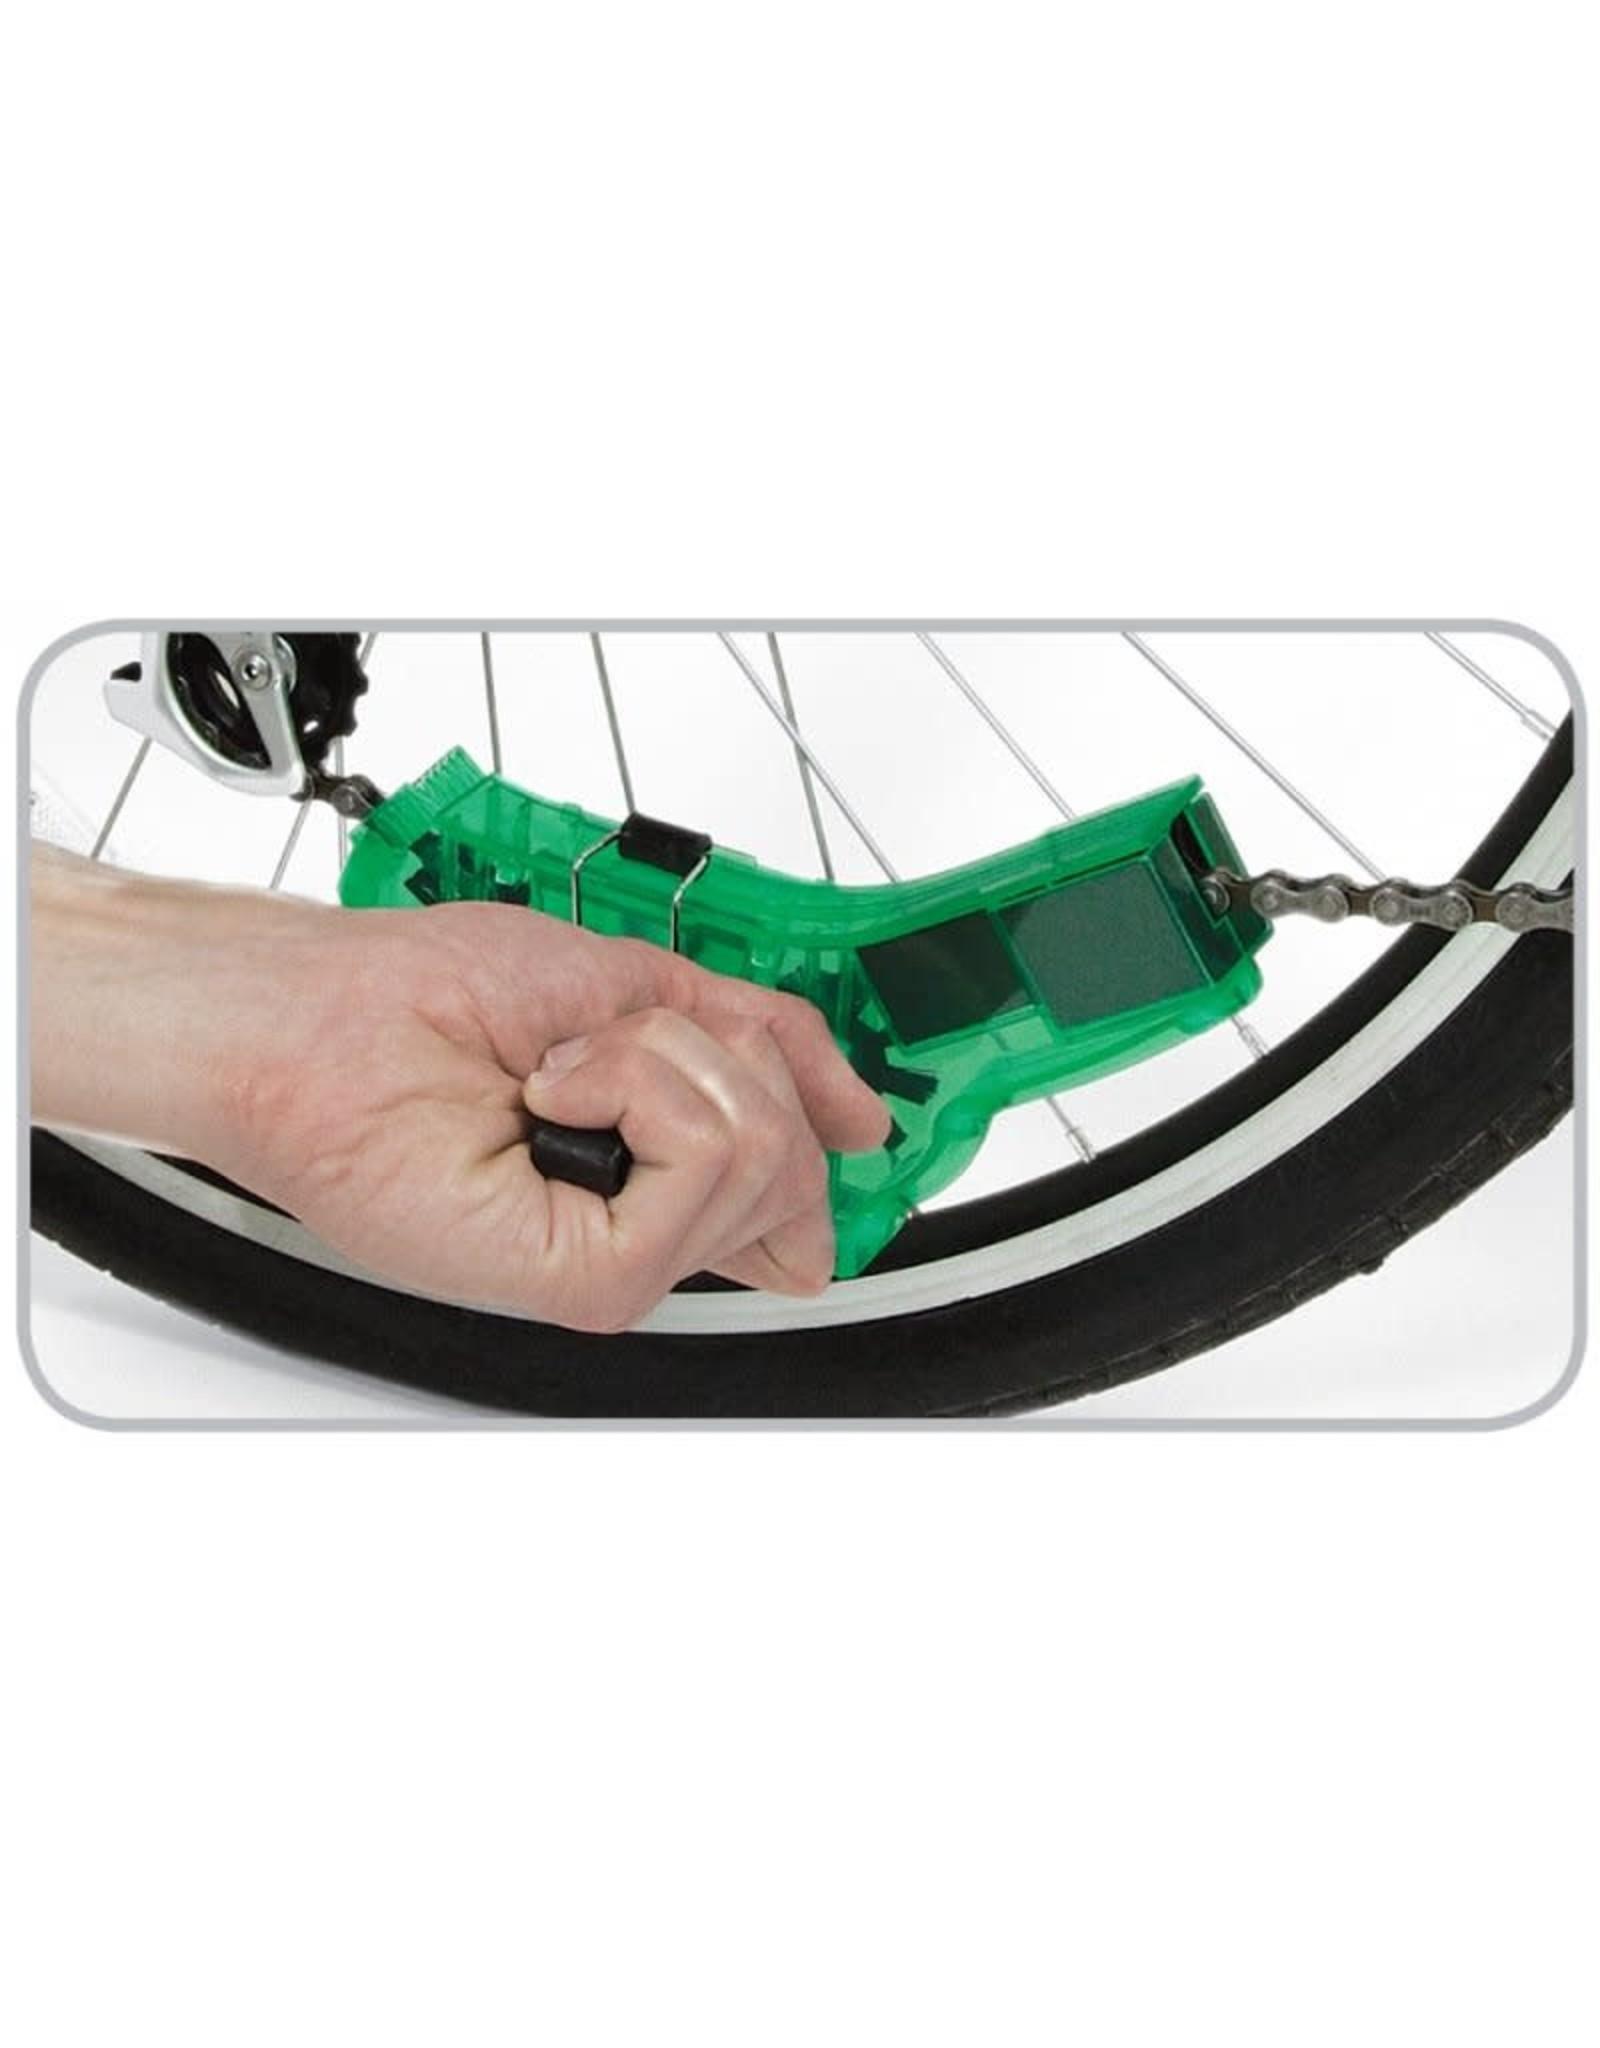 Park Tool FL-C220 : Finish LIne  Chain Cleaner Machine